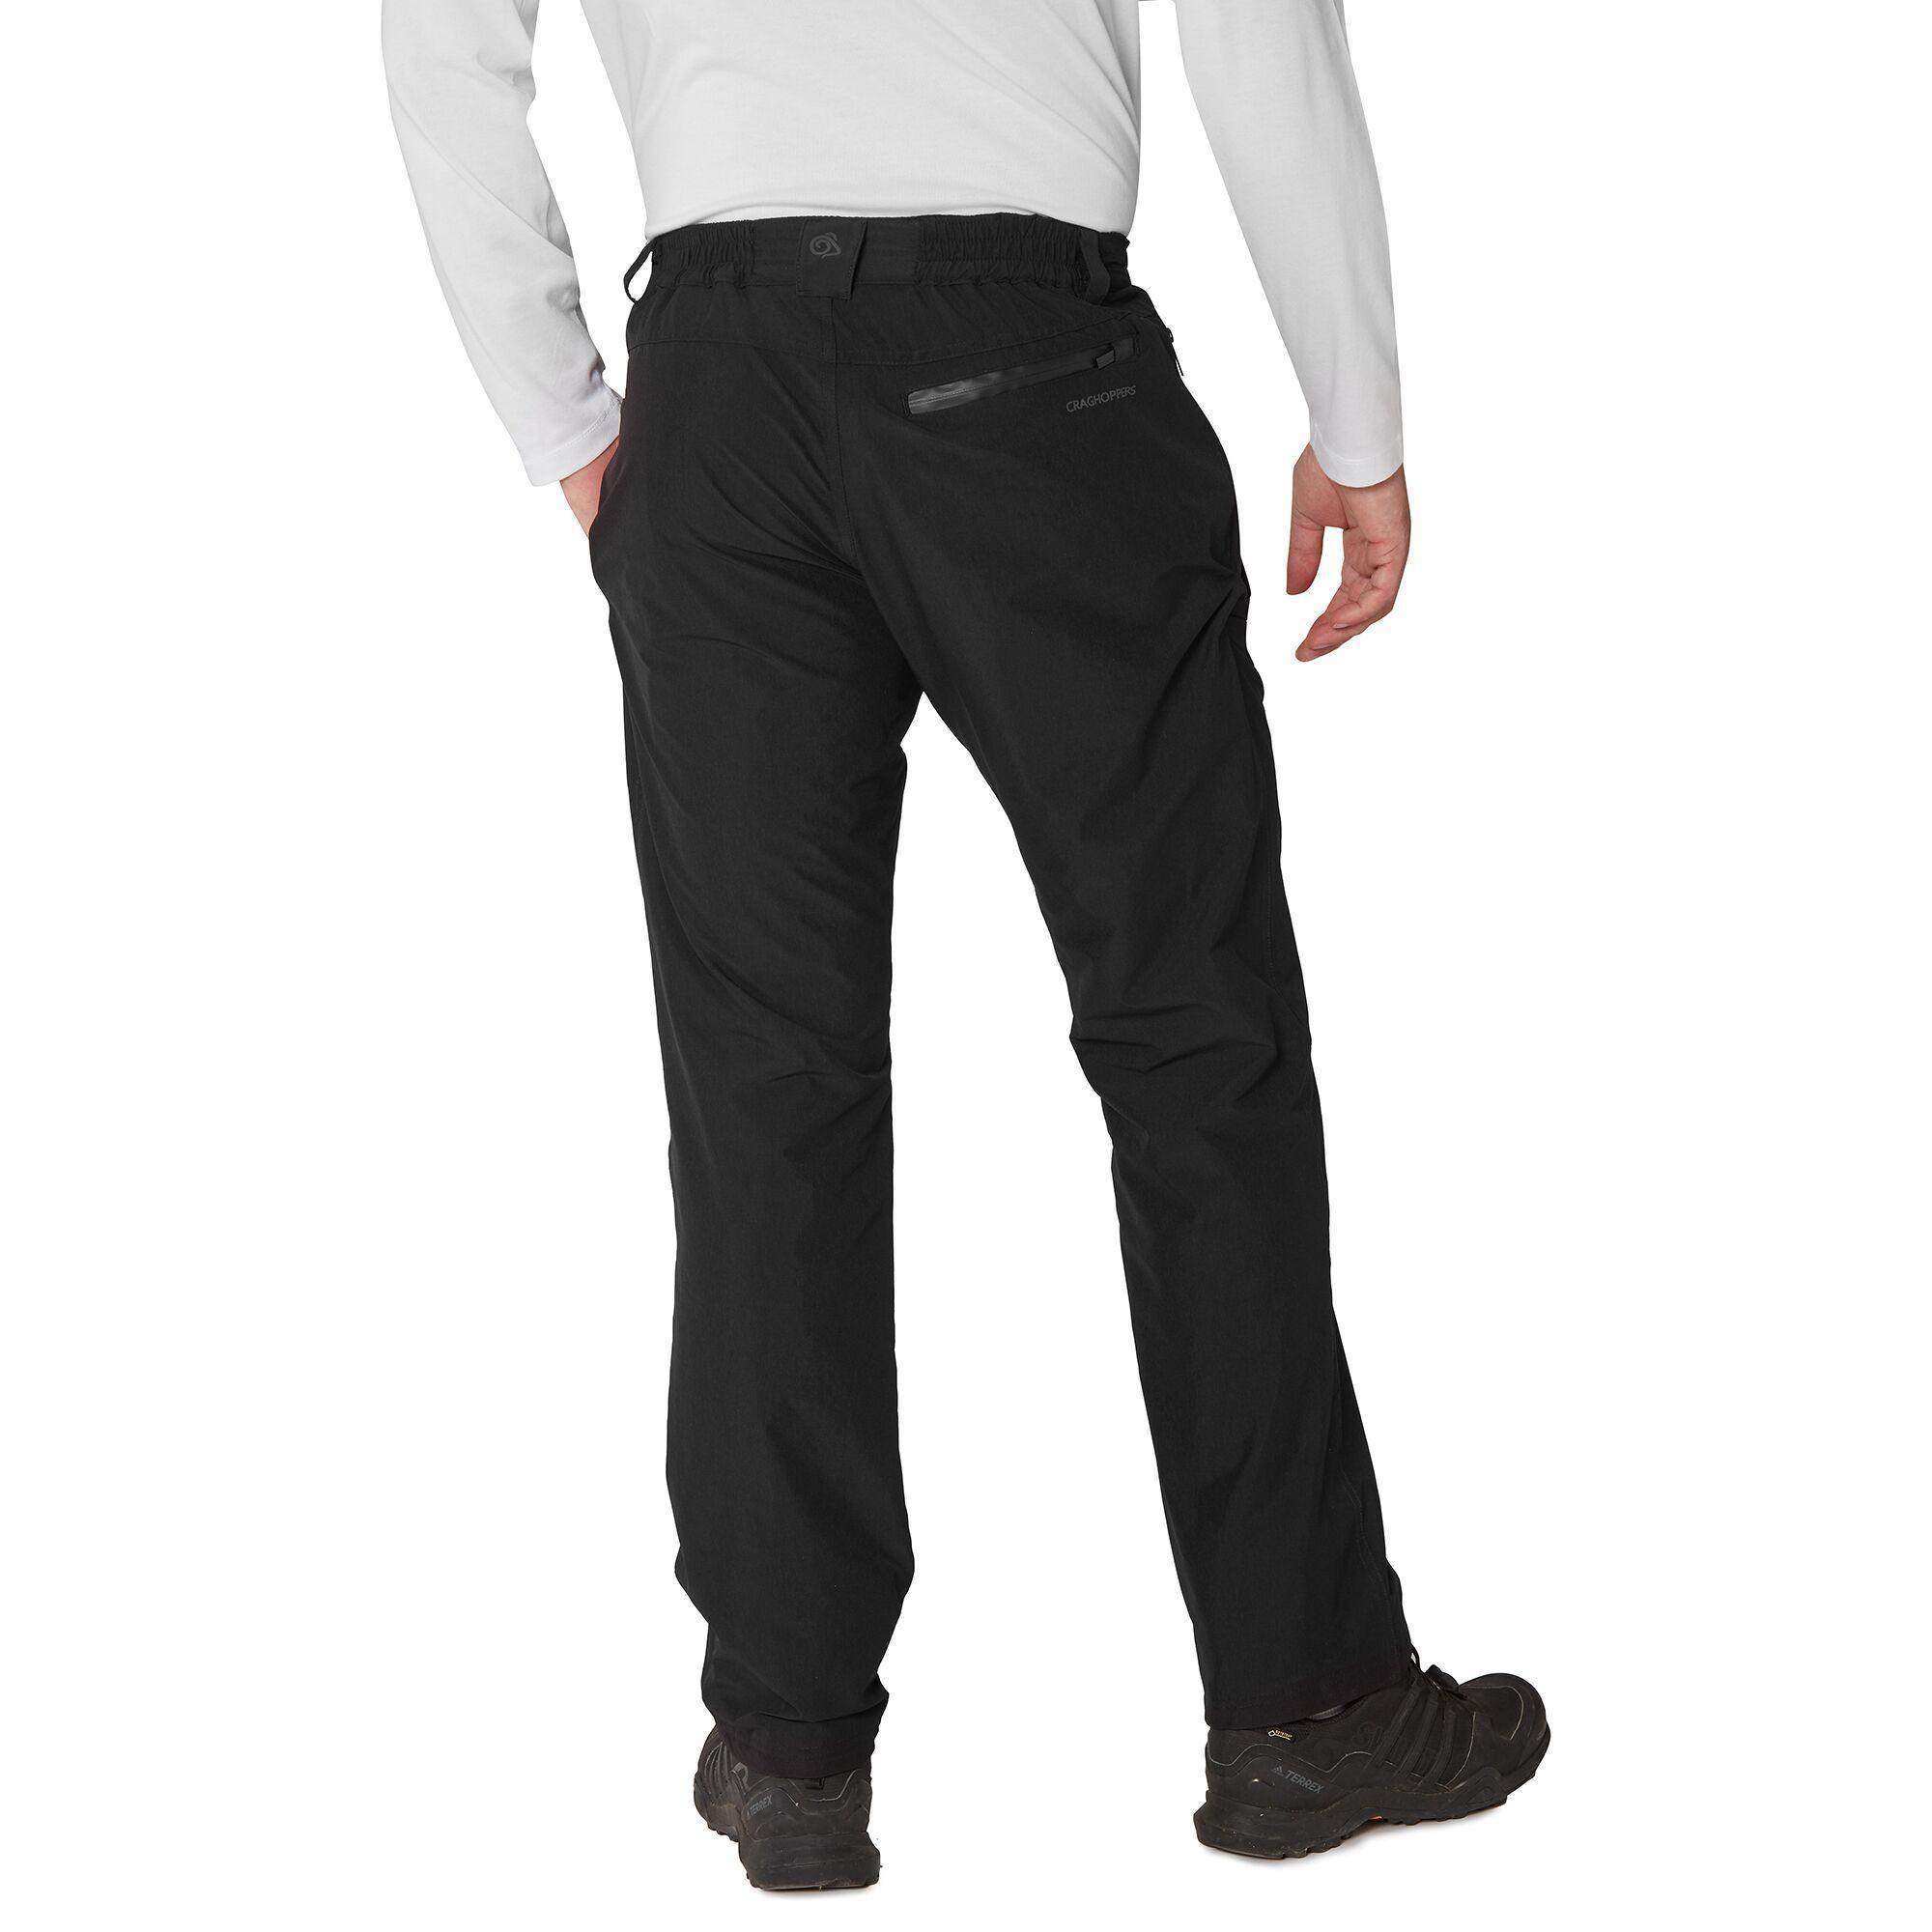 Craghoppers Mens Kiwi Pro Waterproof Trousers